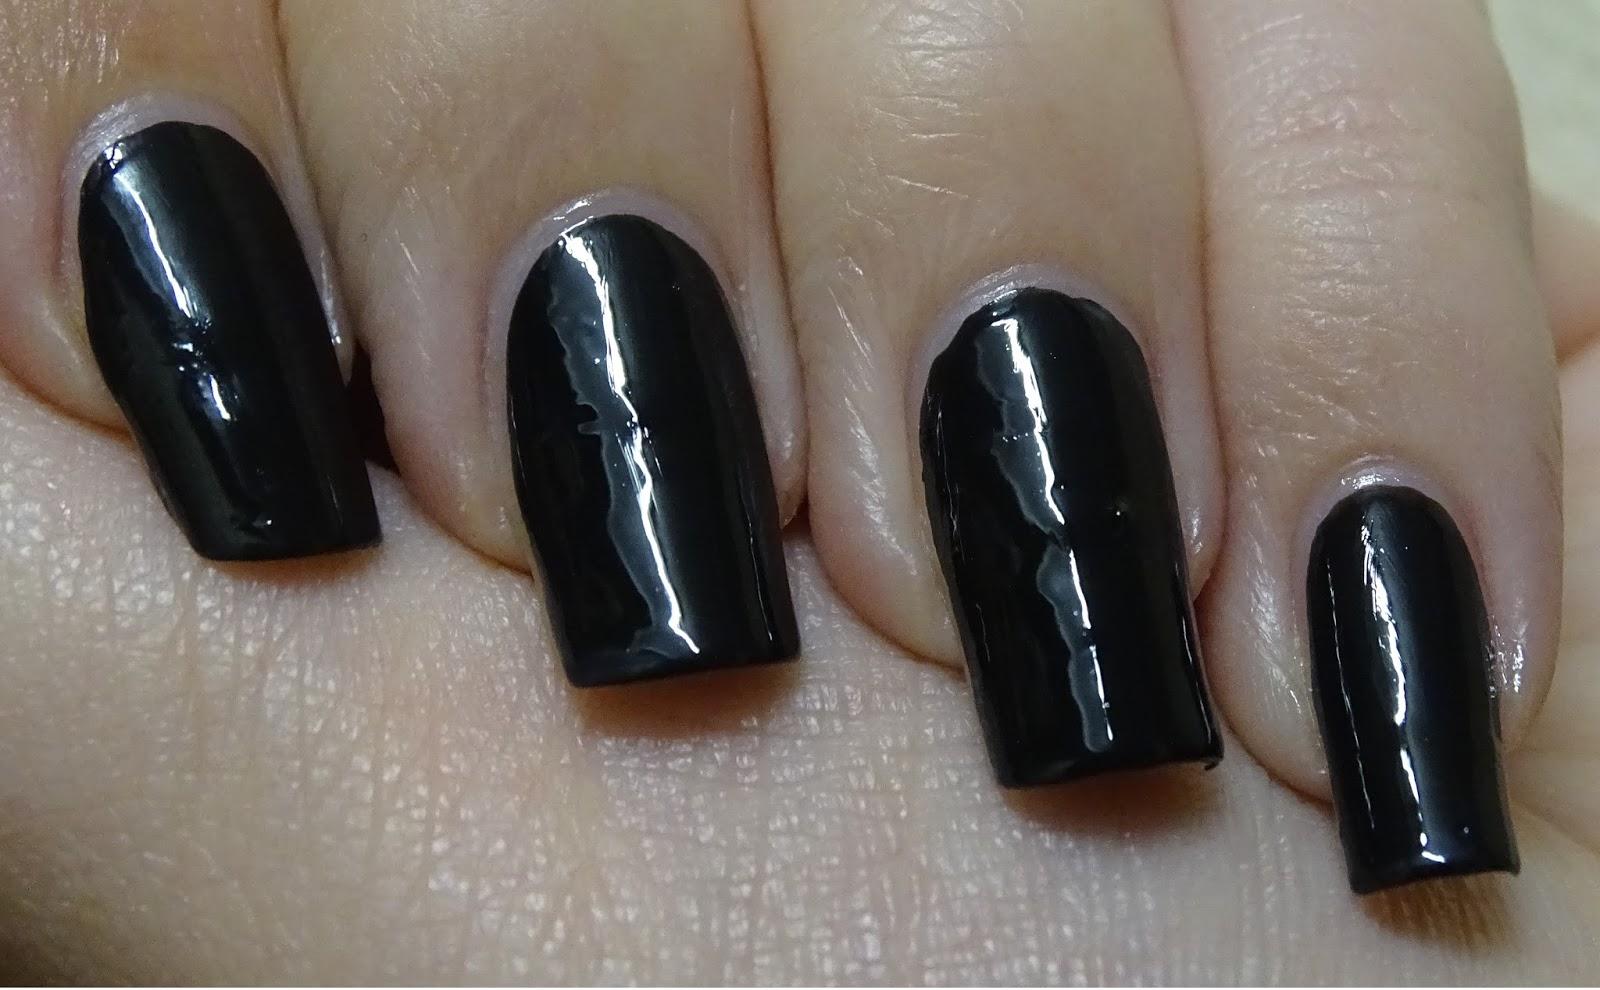 Das Mini bloggt: [Nagellack] Catrice 20 Black to the Routes